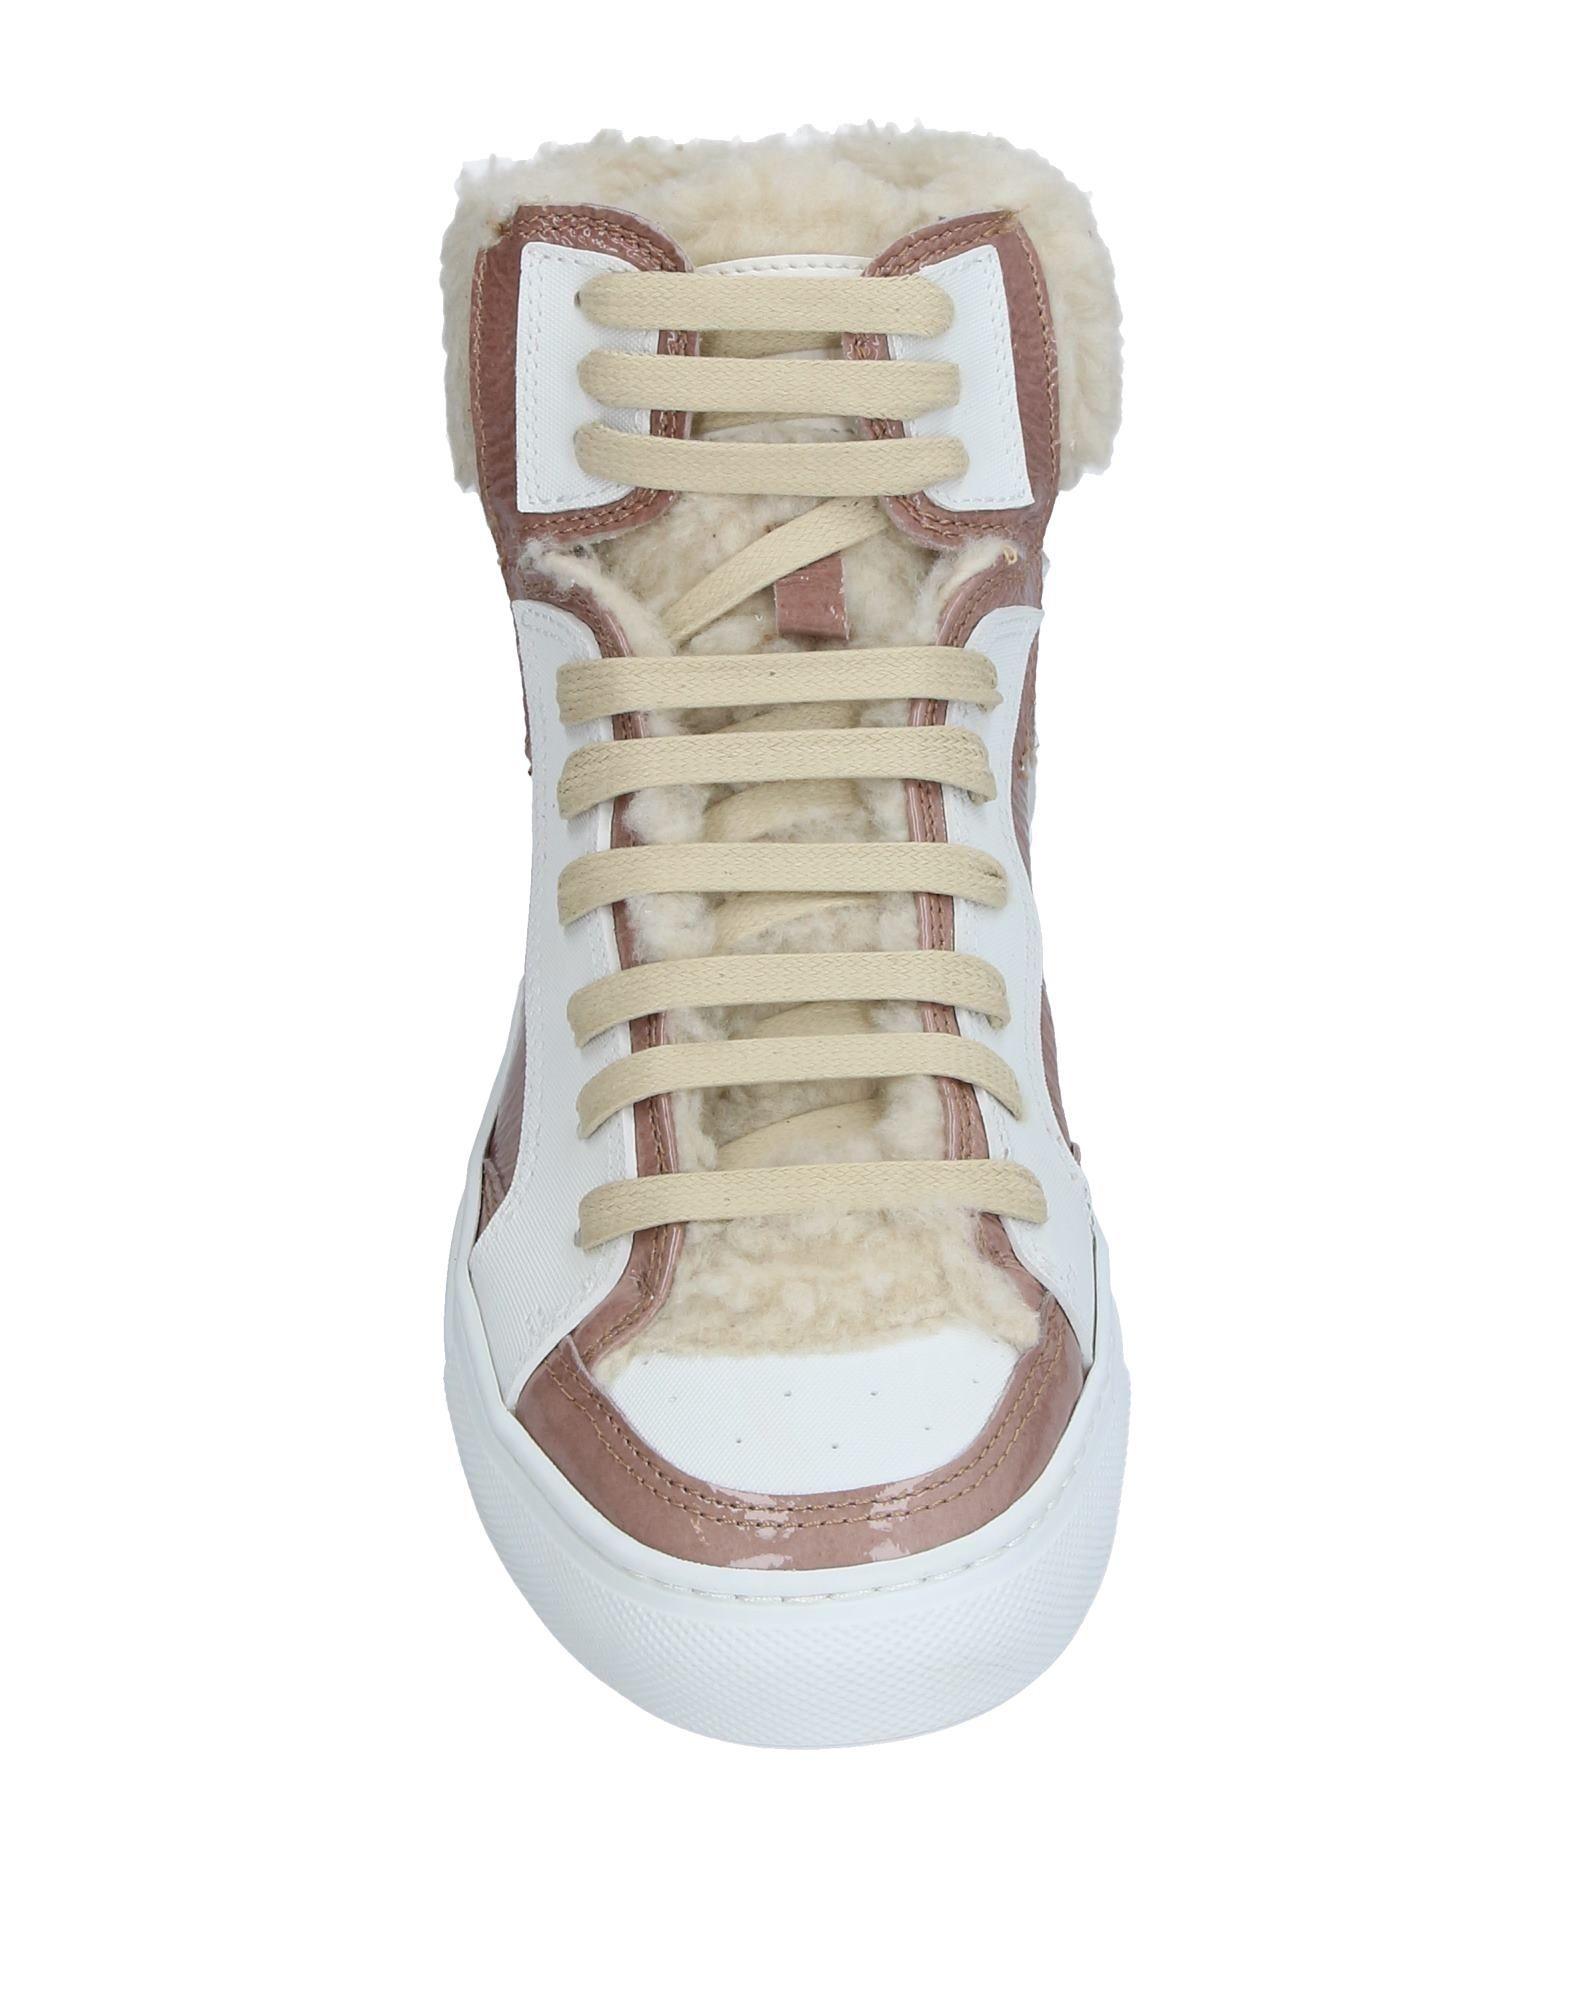 Mm6 Maison Margiela beliebte Turnschuhes Damen 11241372II Gute Qualität beliebte Margiela Schuhe 067b1c